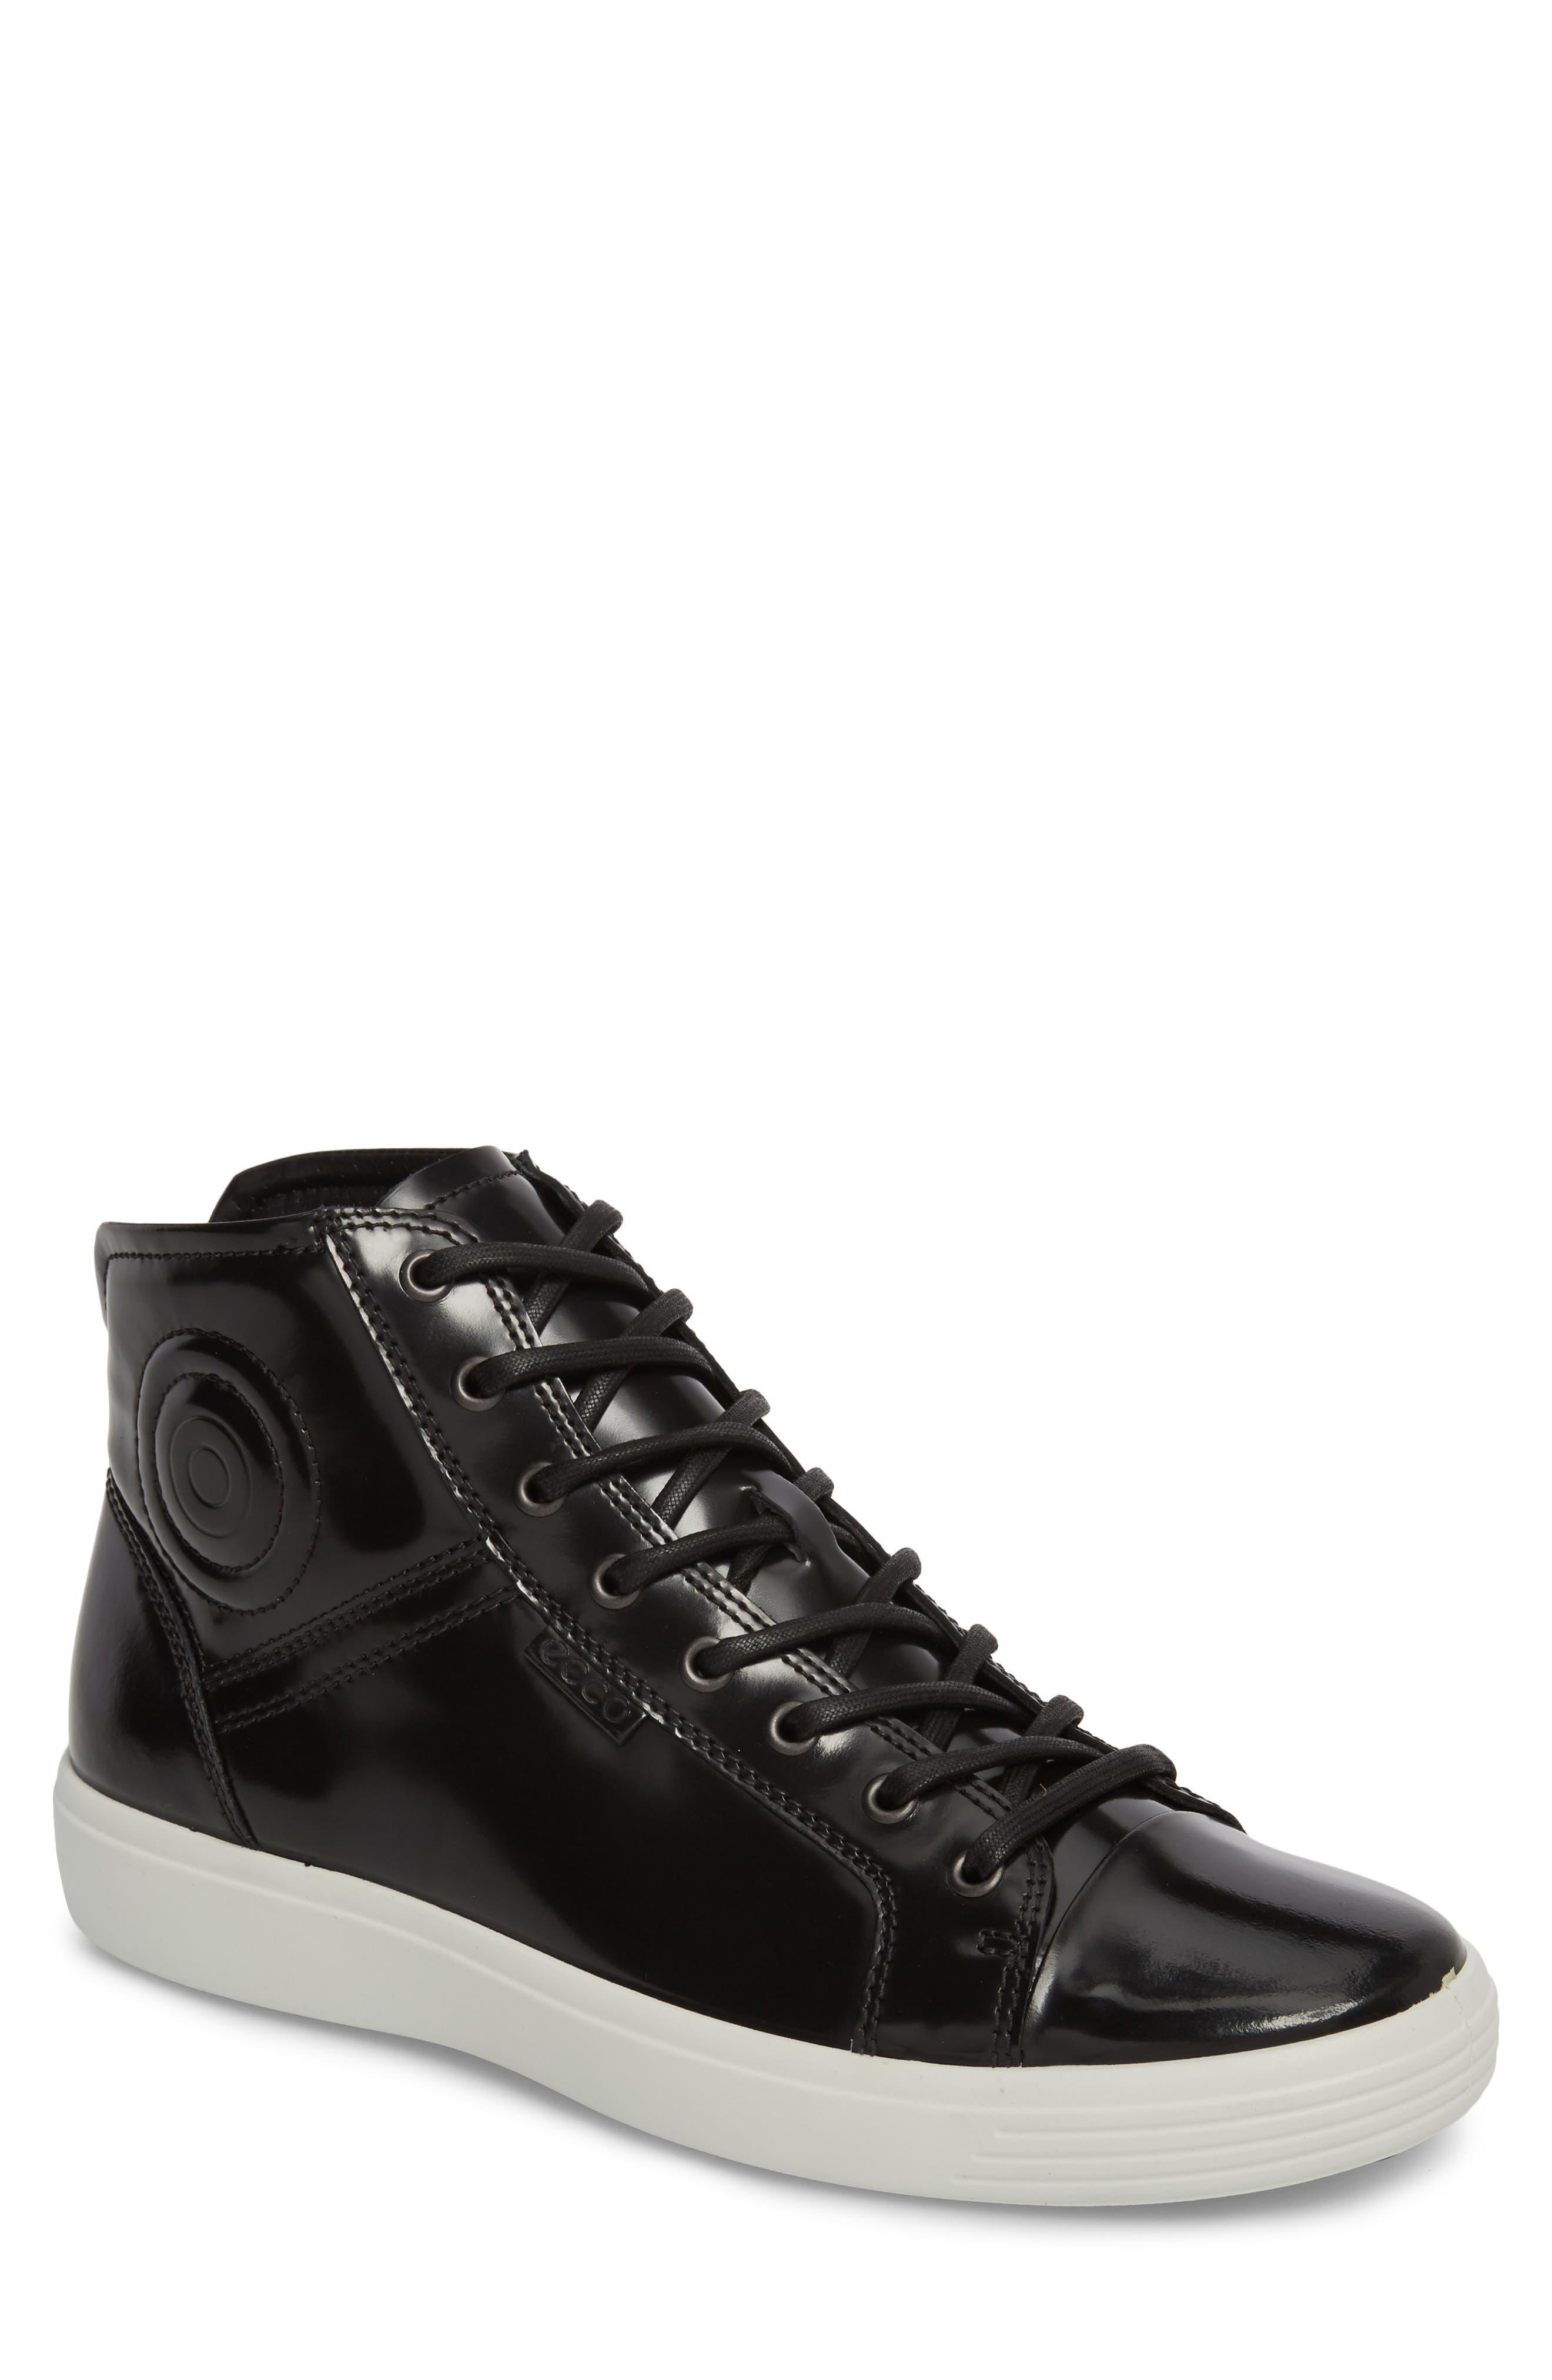 Soft 7 Premium High Top Sneaker,                             Main thumbnail 1, color,                             009